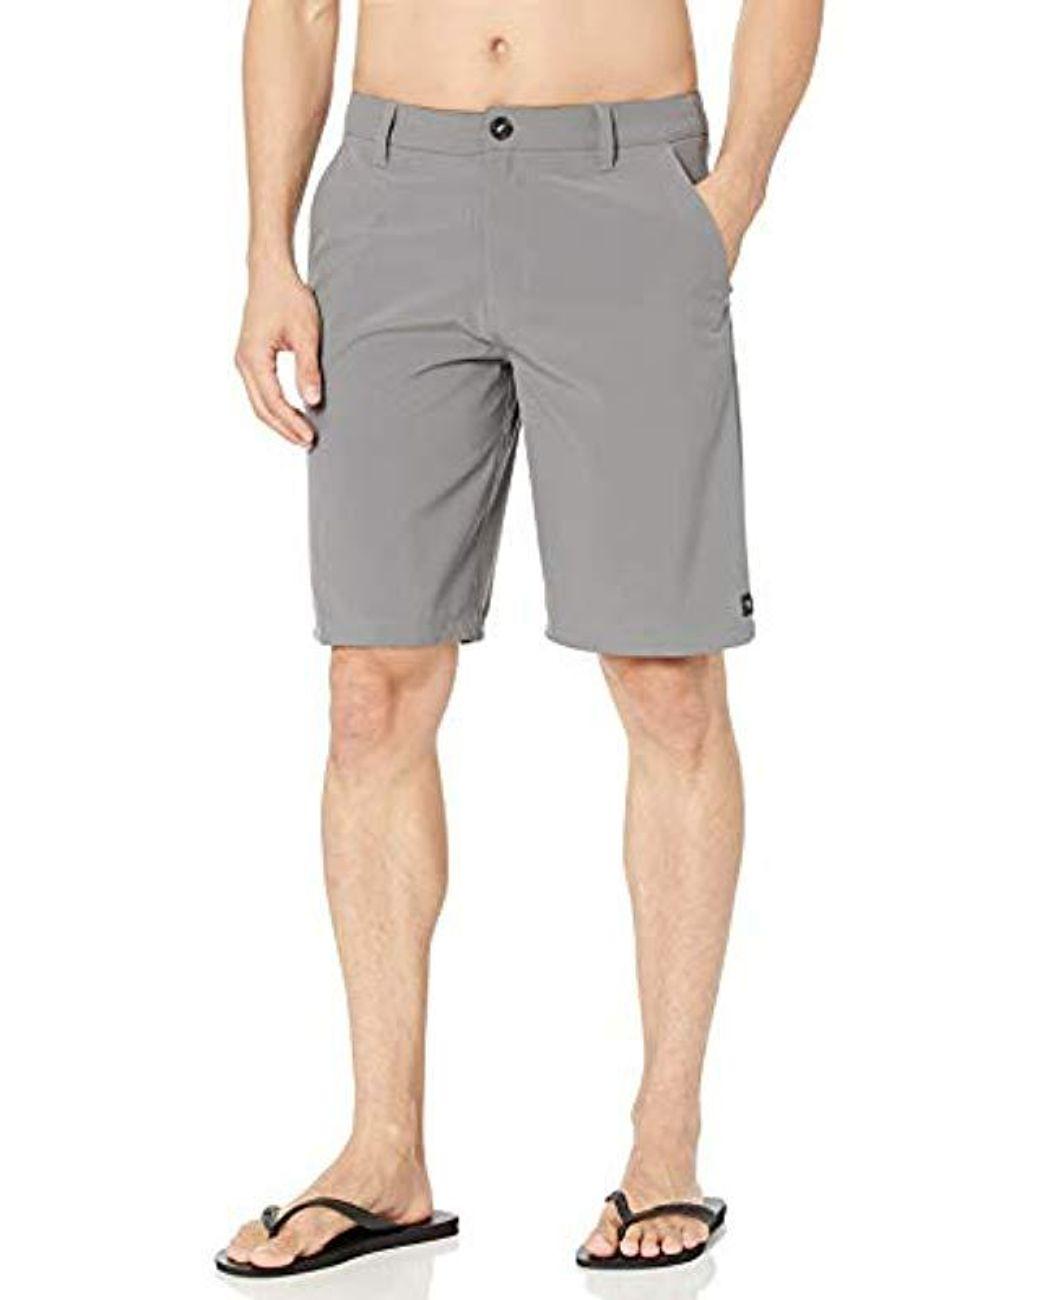 Rip Curl Mens Mirage Jackson 20 Boardwalk Hybrid Shorts